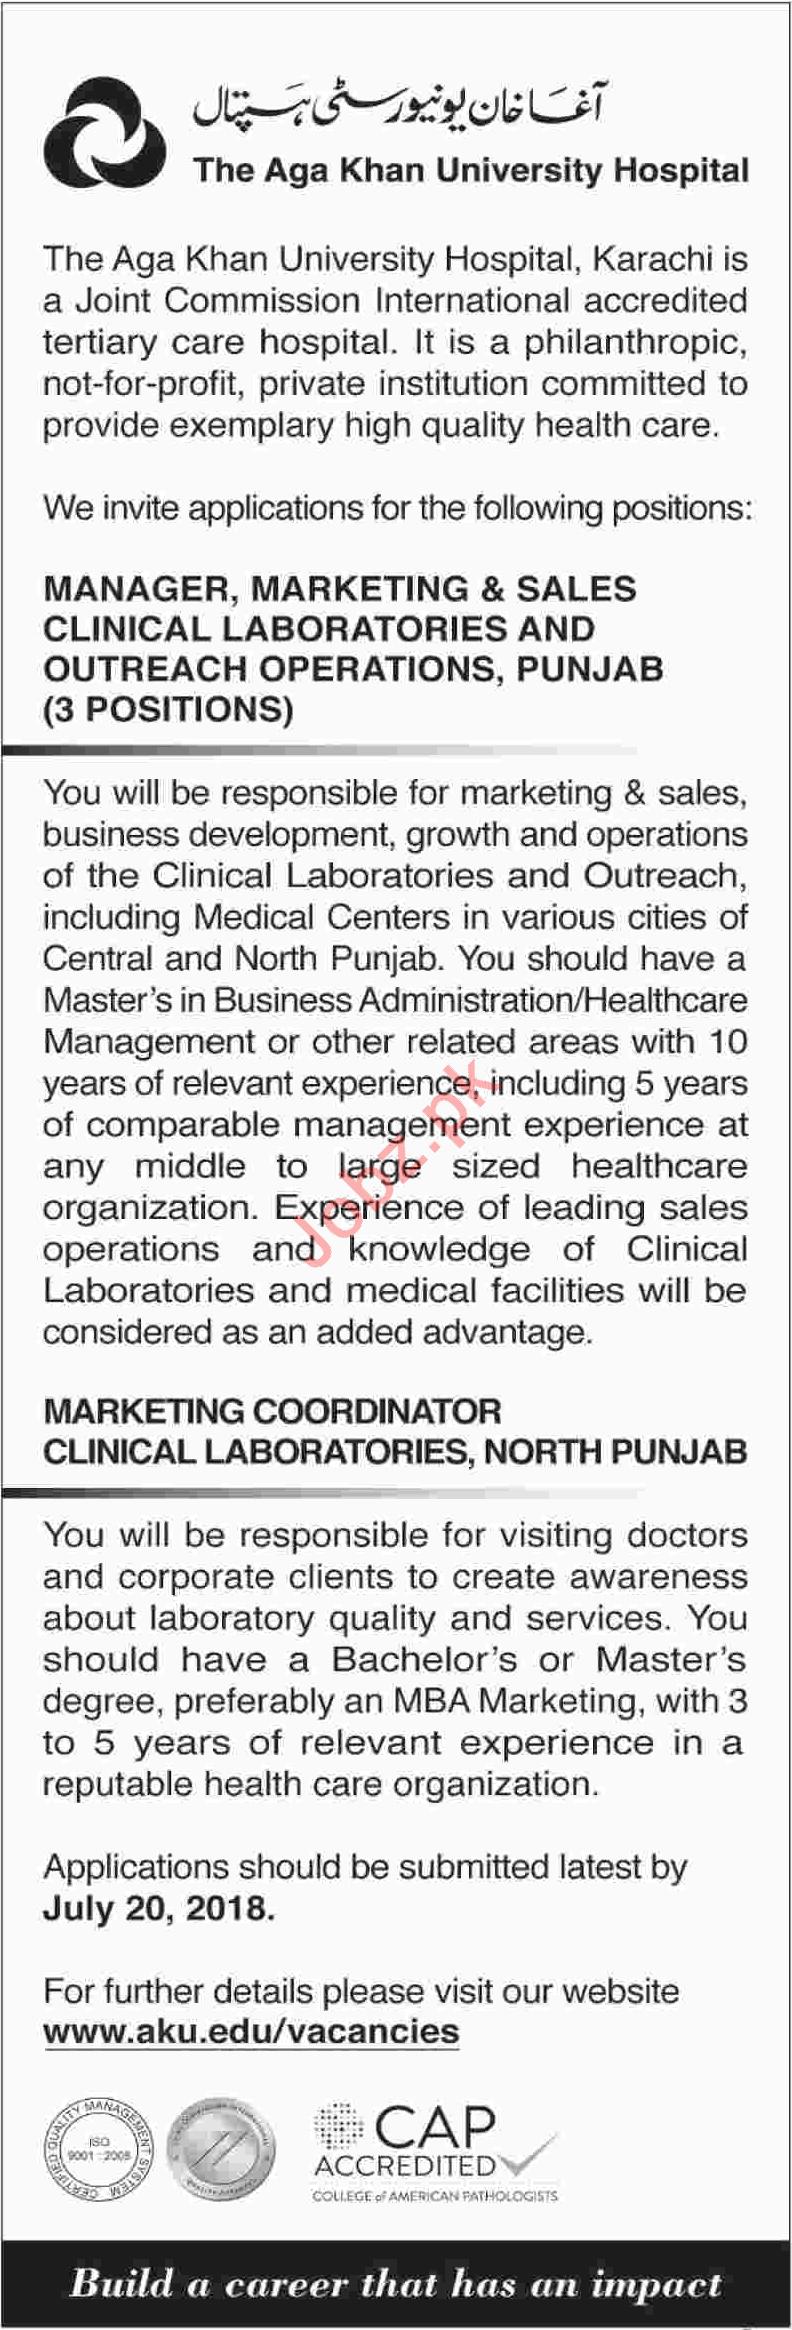 Aga Khan University Hospital AKU Karachi Jobs 2018